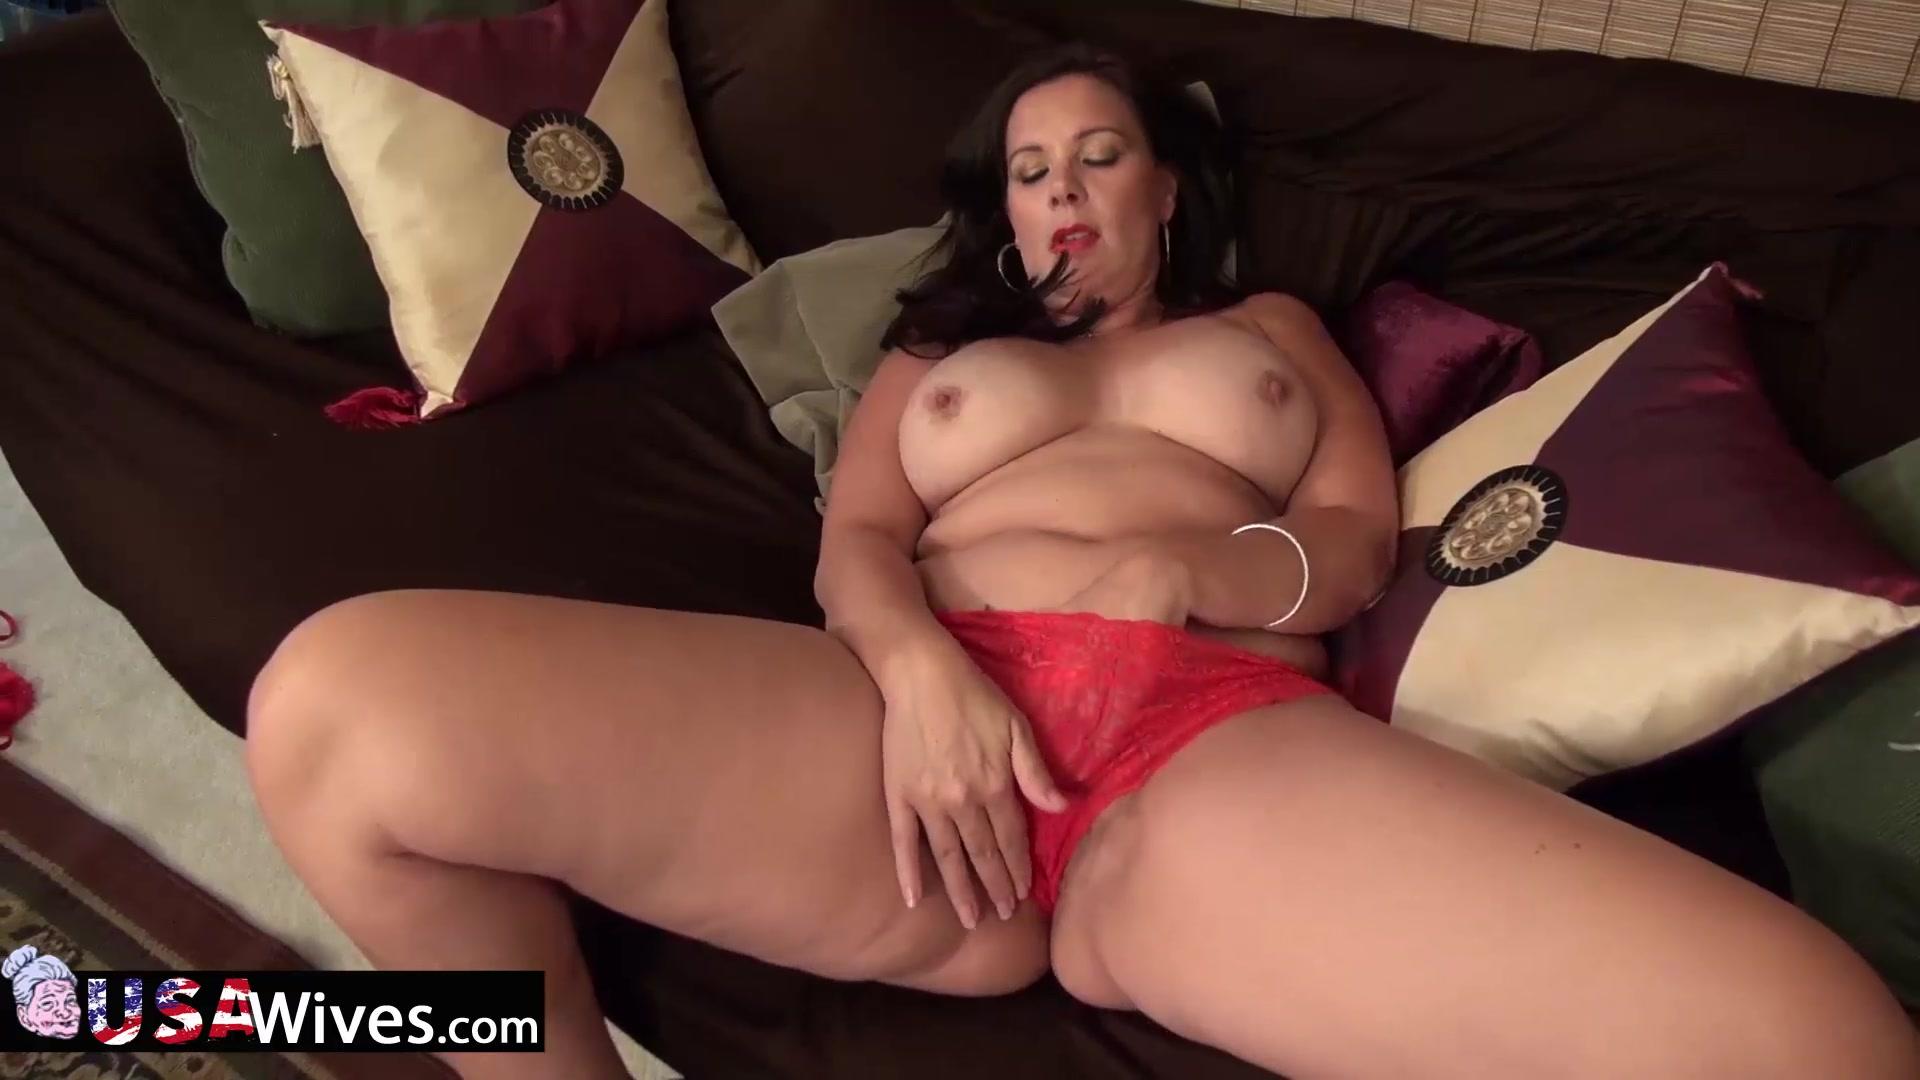 Mature lady dylan masturbating alone